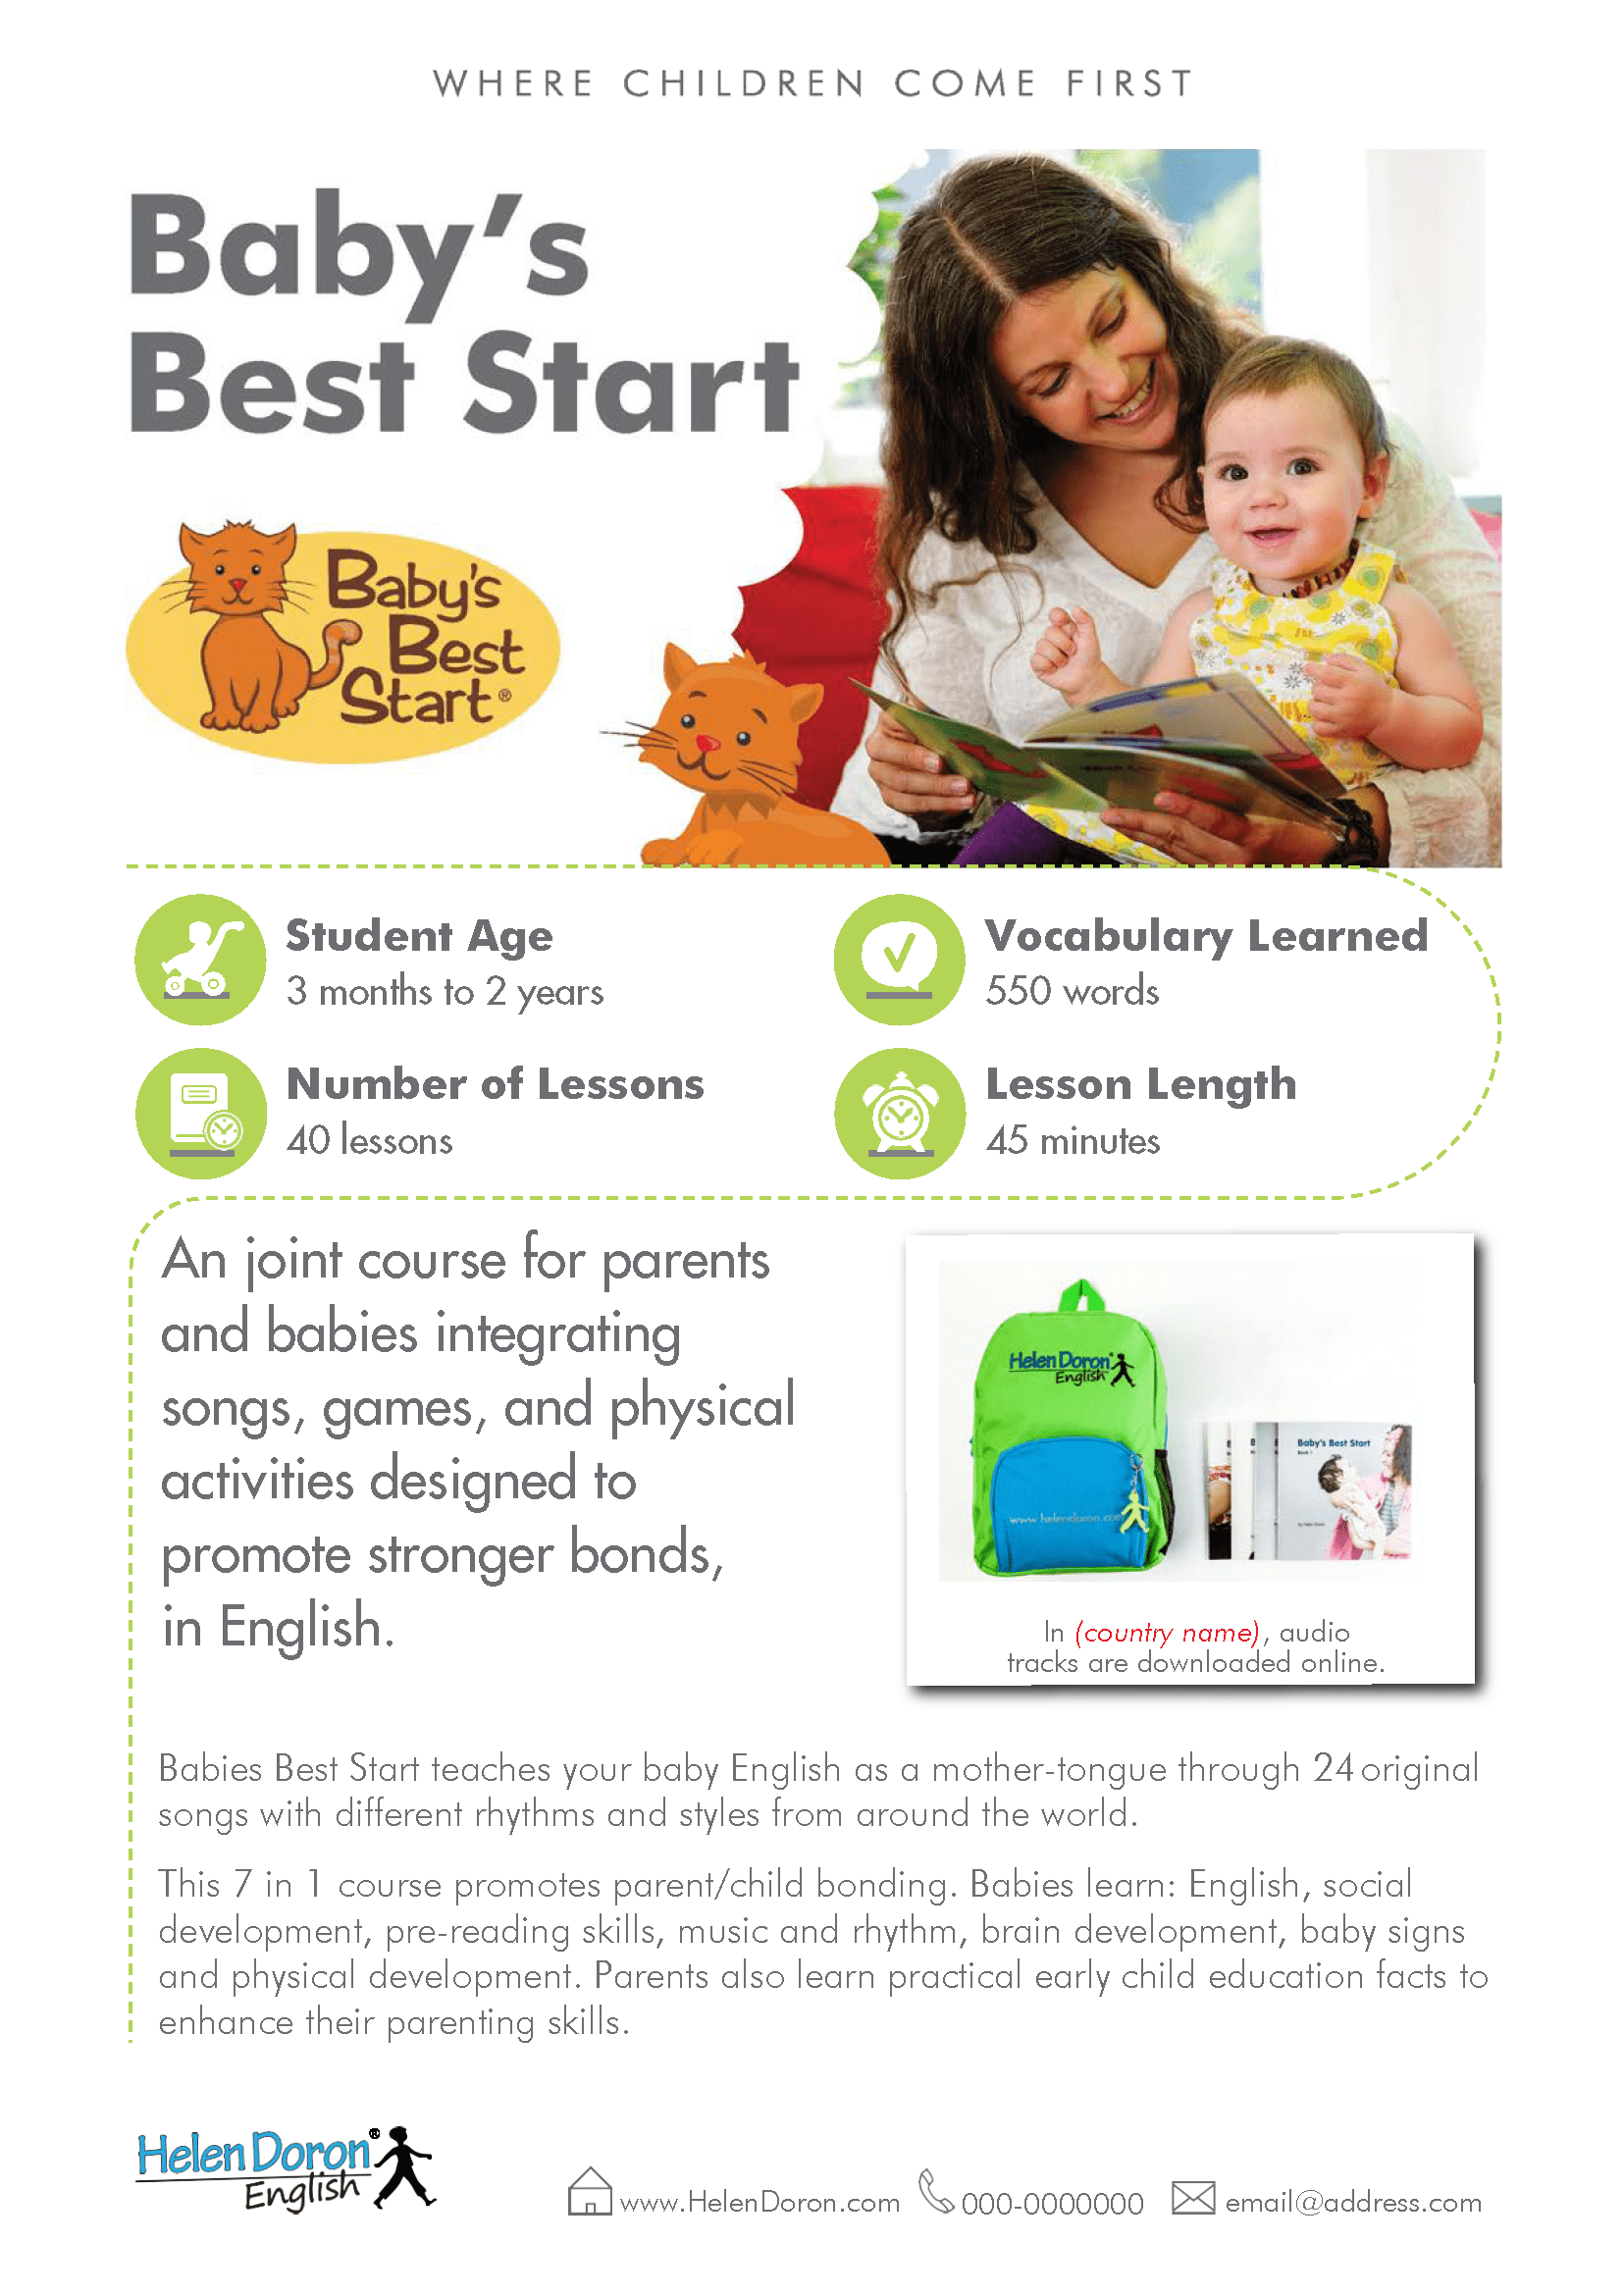 Descargar - Baby's Best Start